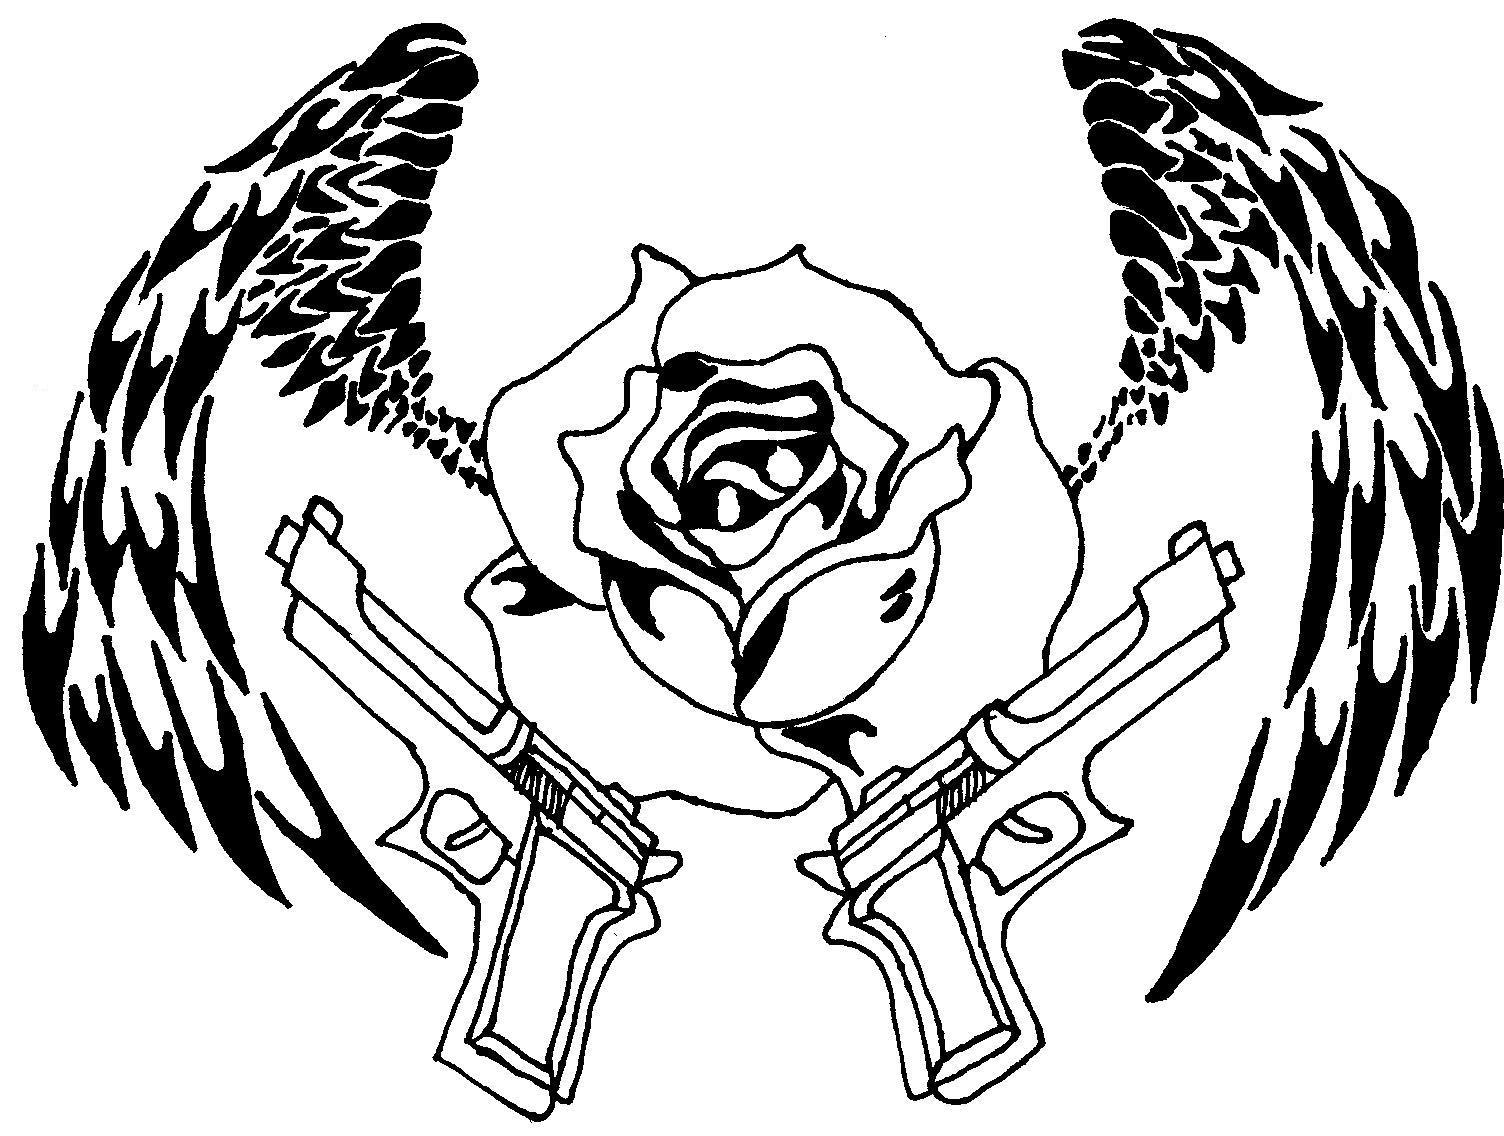 Guns and Roses by 44-magnum-vampire on DeviantArt